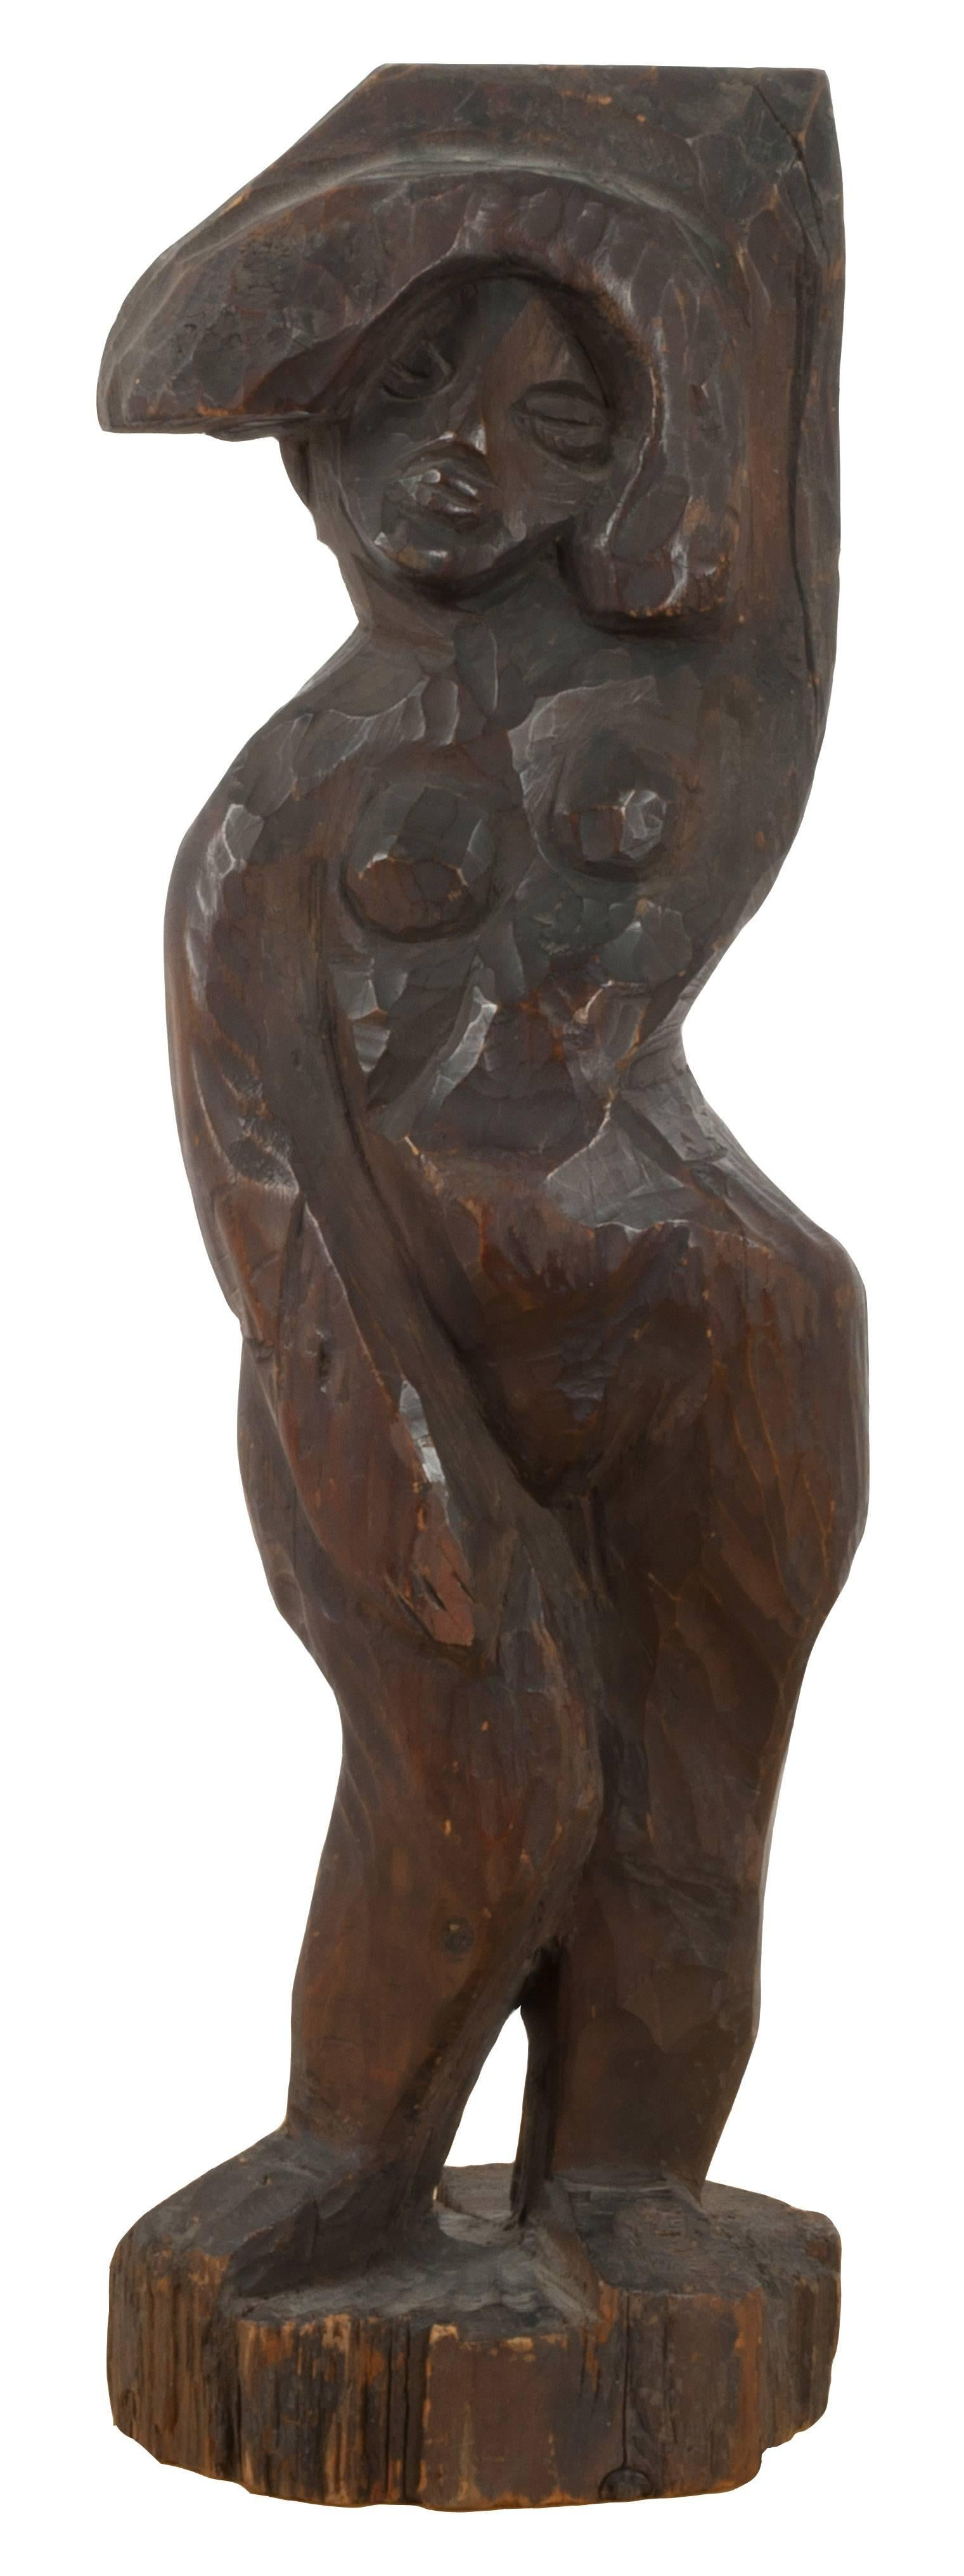 Standing Female Nude After Alexander Archipenko Negress (La Negresse)